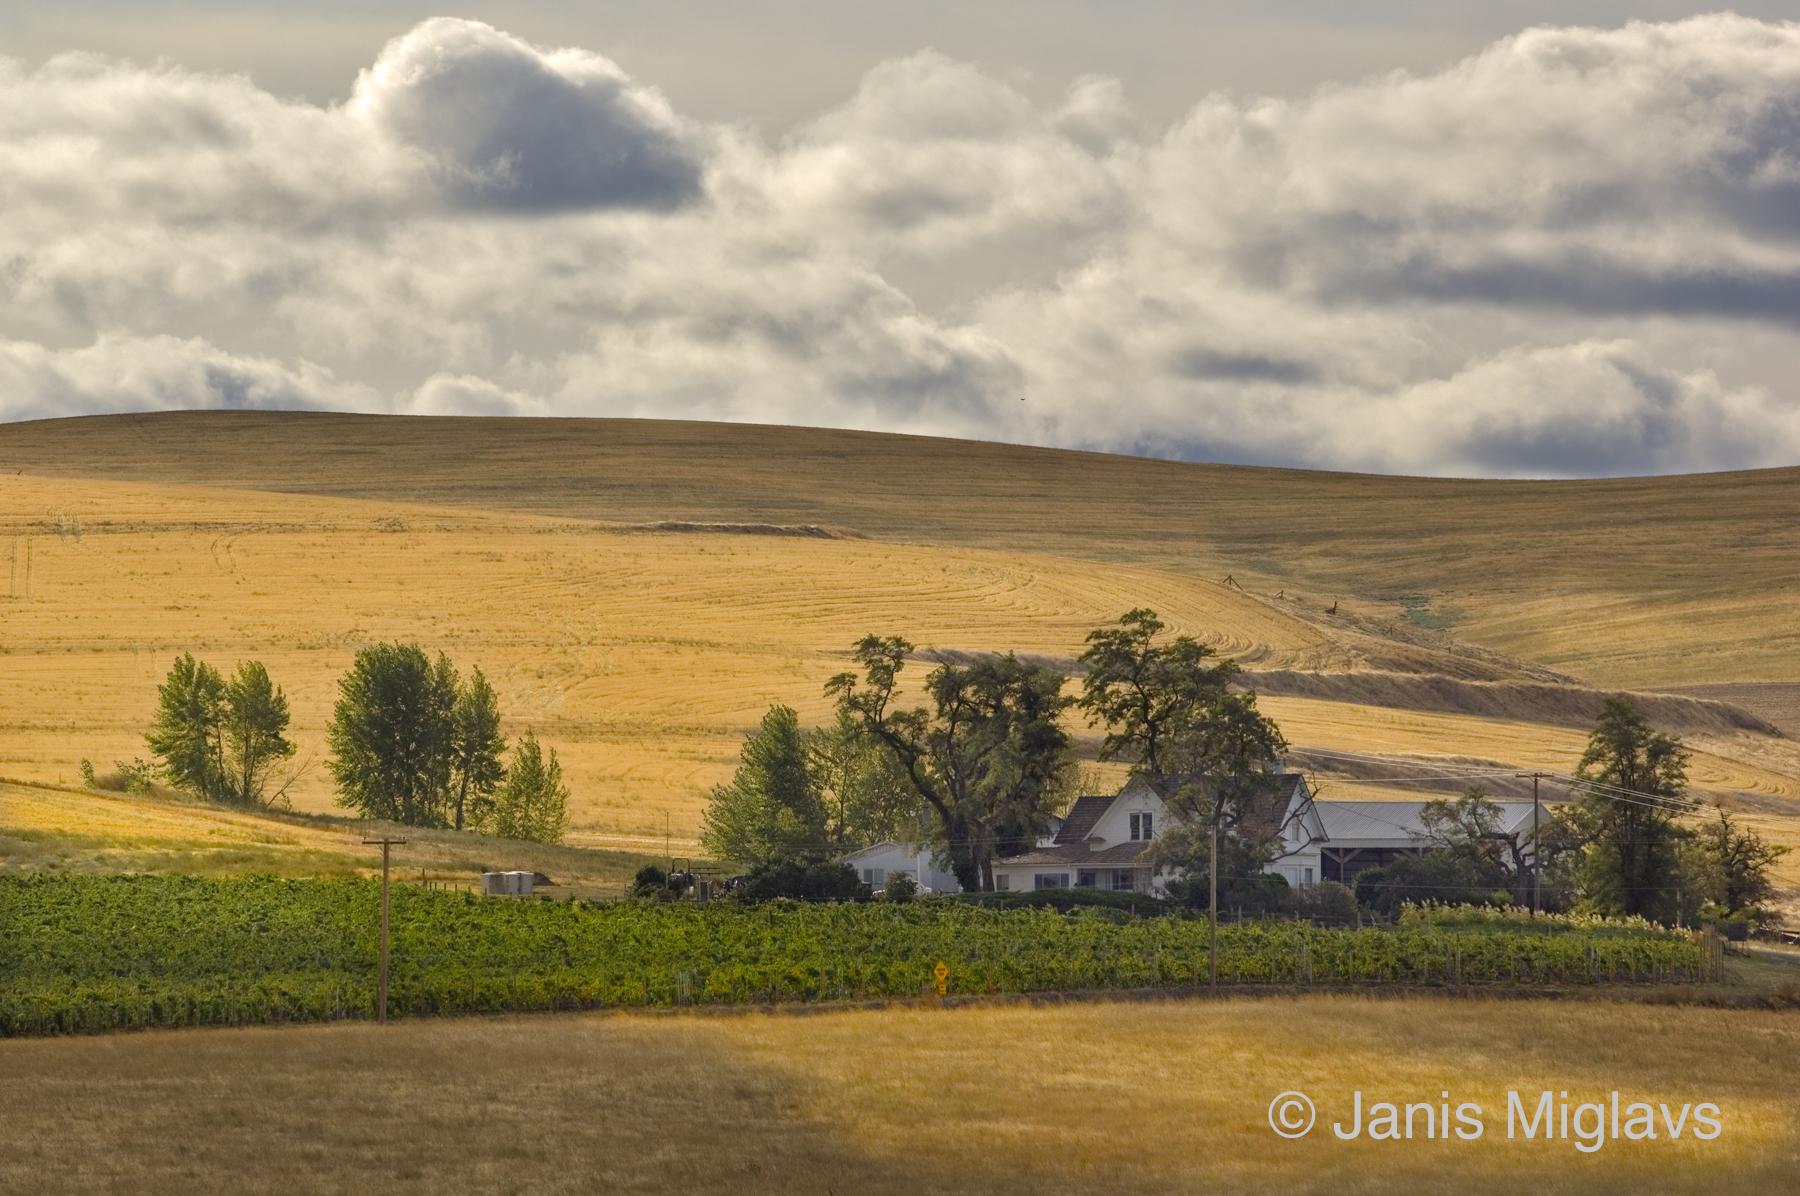 Oregon Walla Walla Farm With Vineyard